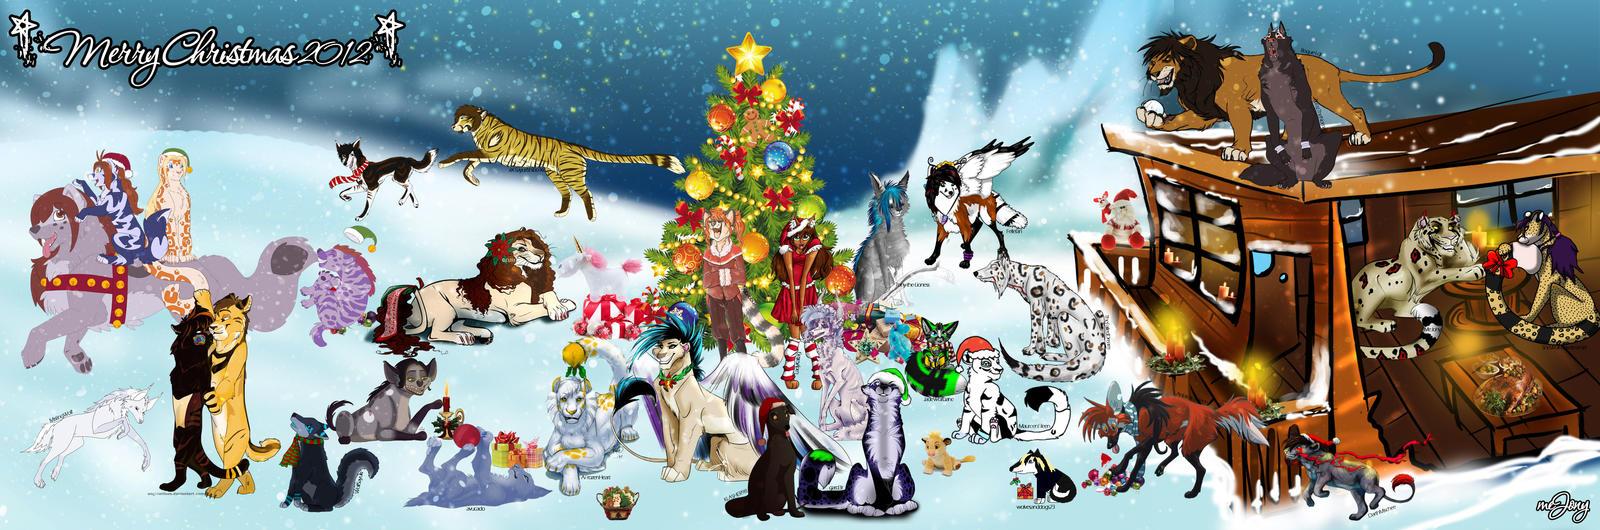 Christmas Collab 2012 by JonyRichardson